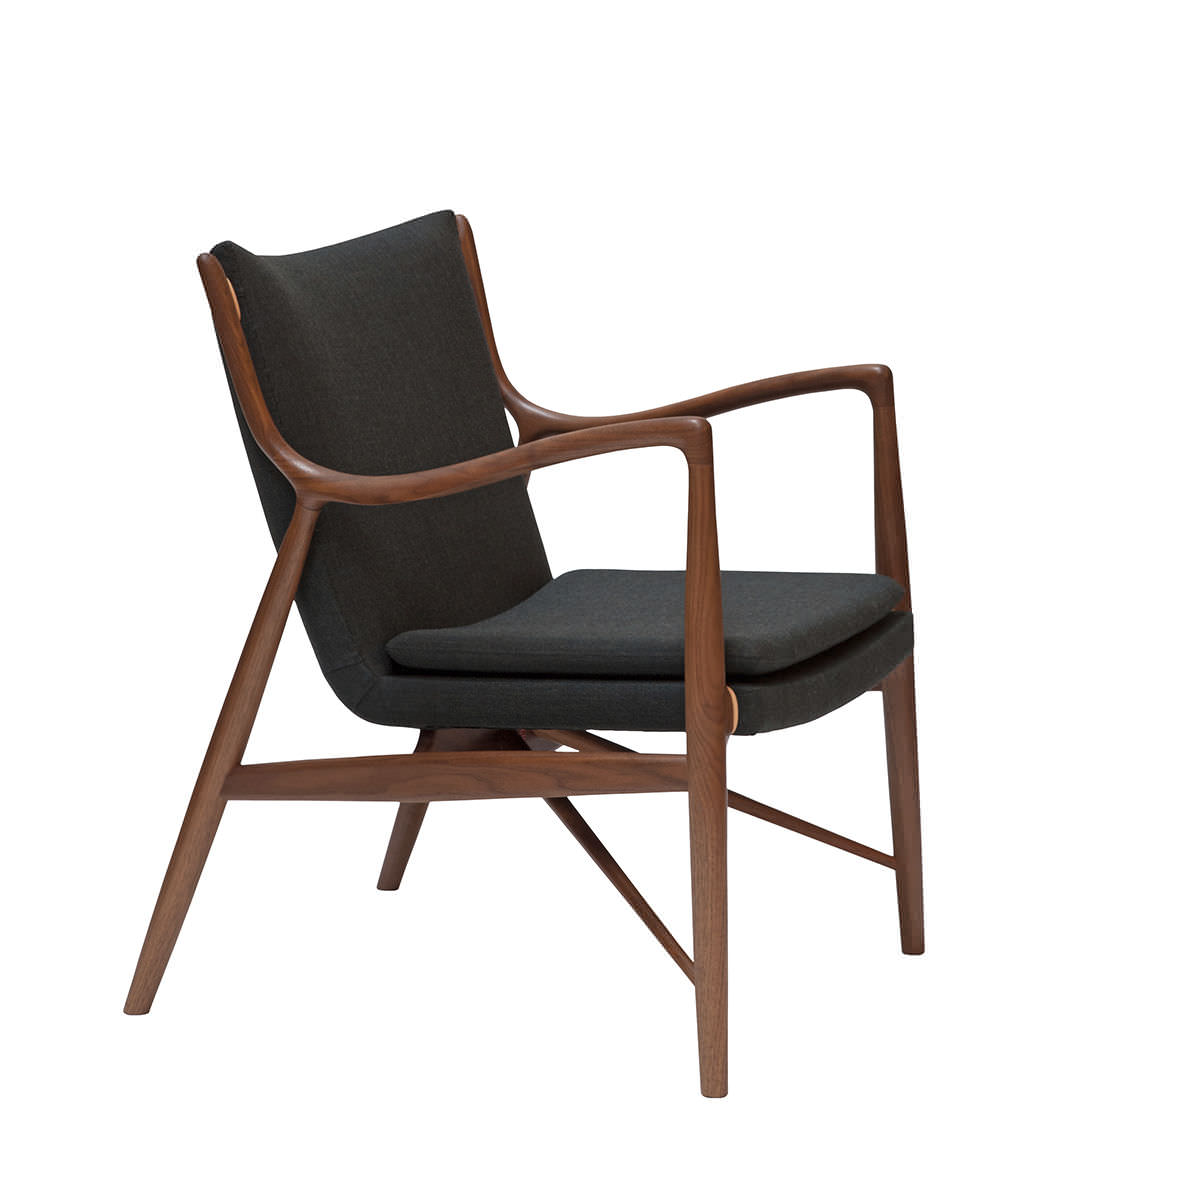 Fauteuil Cuir Design Scandinave Infini Photo - Fauteuil cuir design scandinave